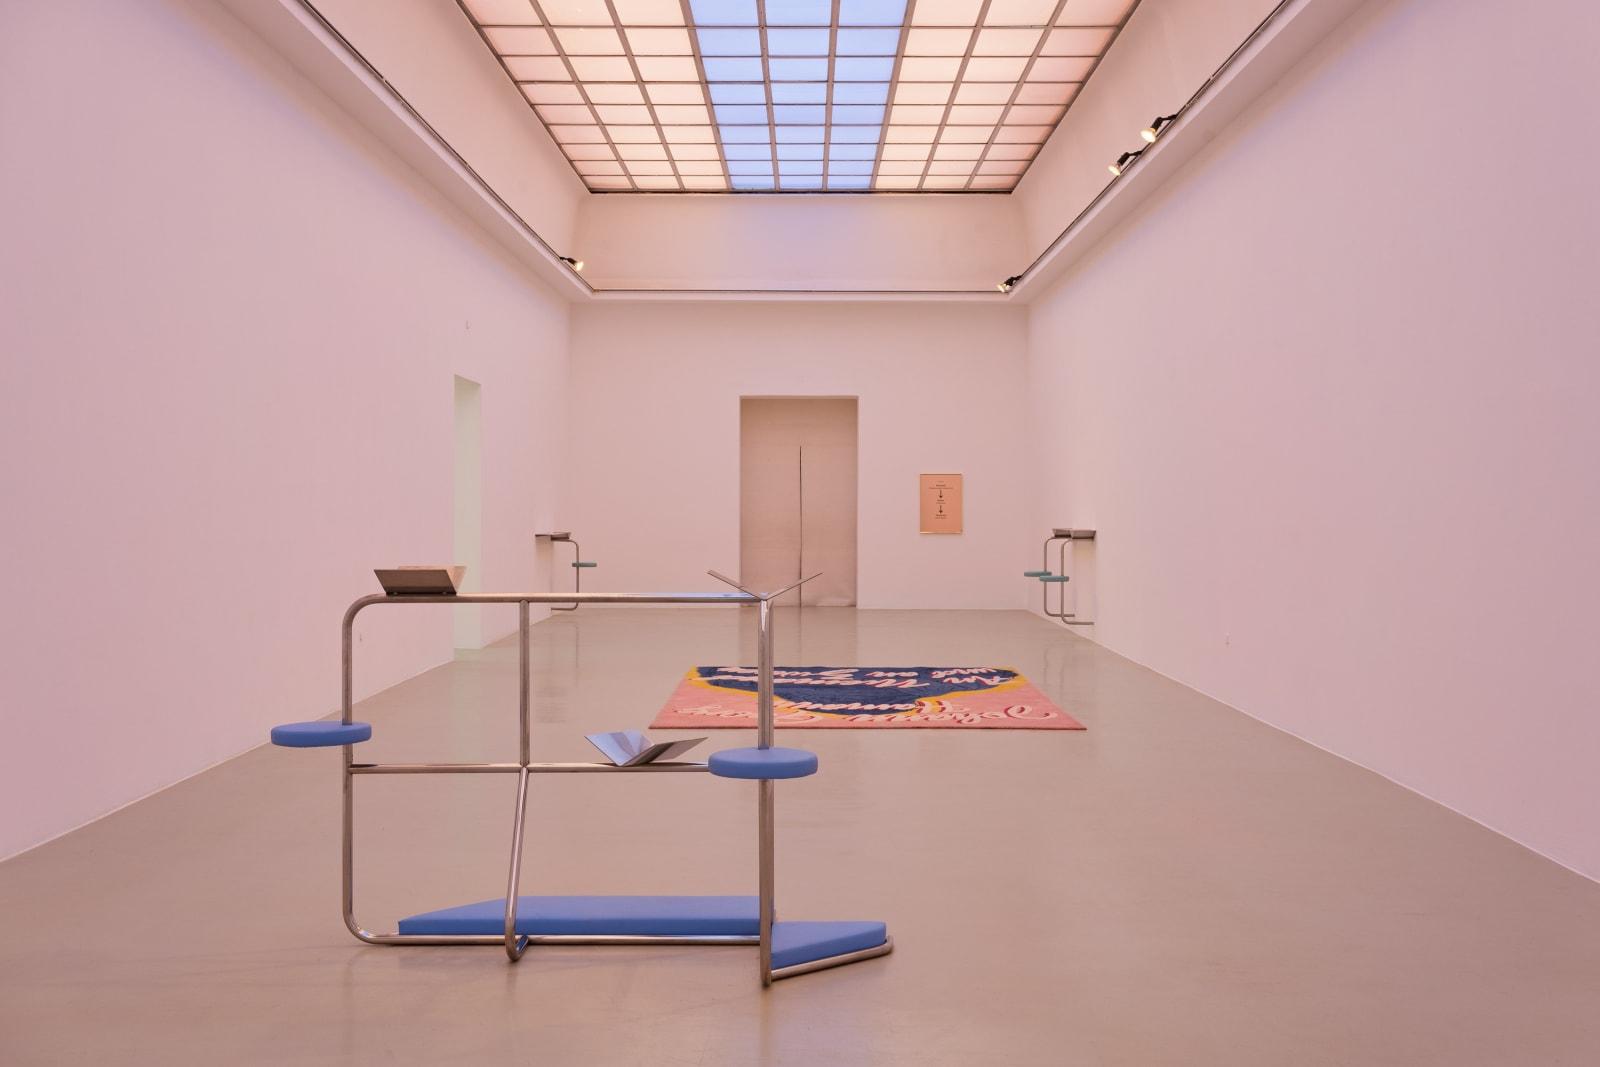 SLAVS AND TATARS exhibition view, Sauer Power, Kunstverein Hannover, 2018